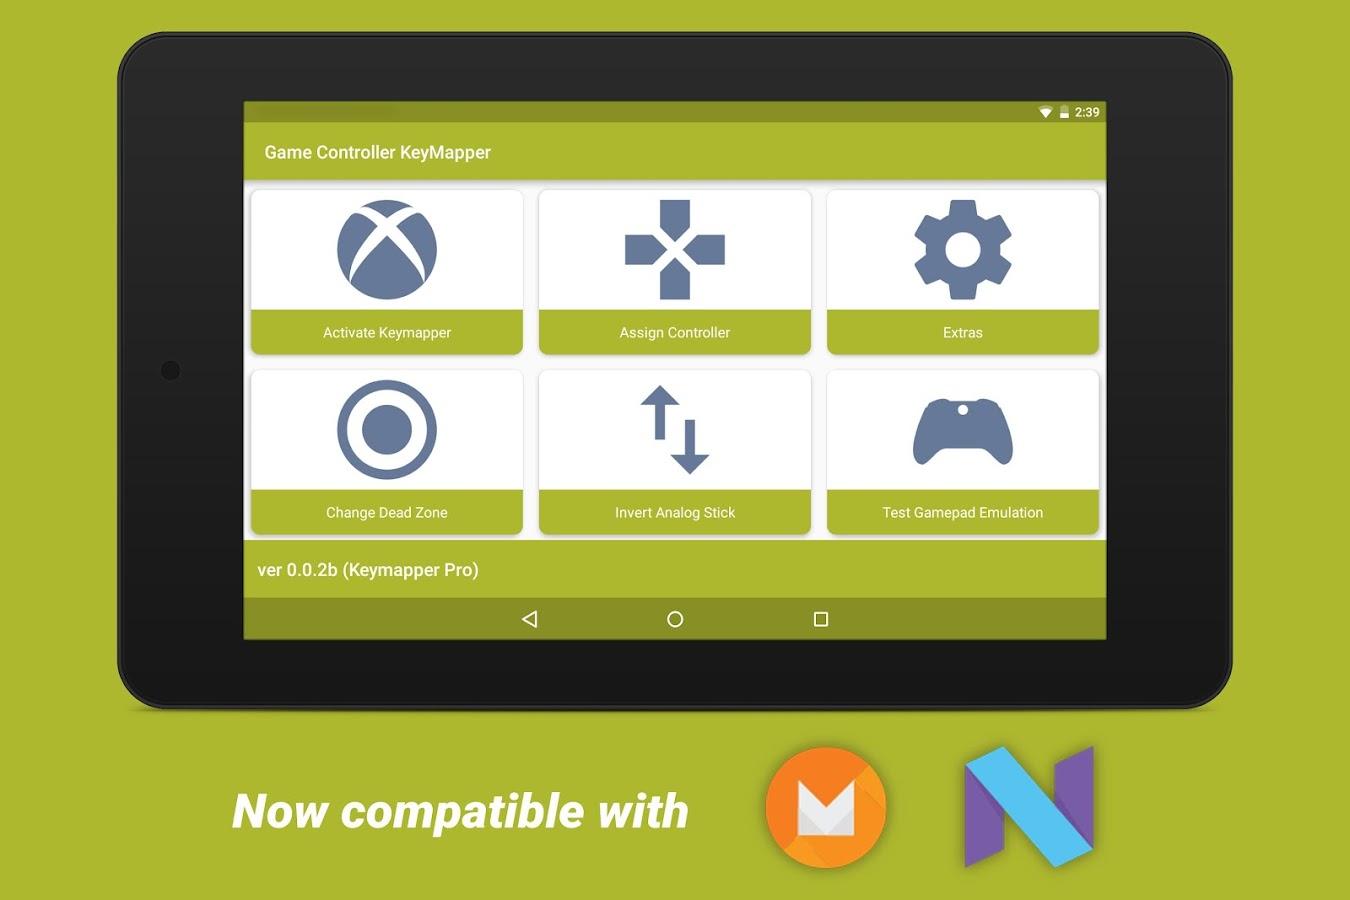 com catalyst06 gamecontrollerverifier 0 2 1 APK Download